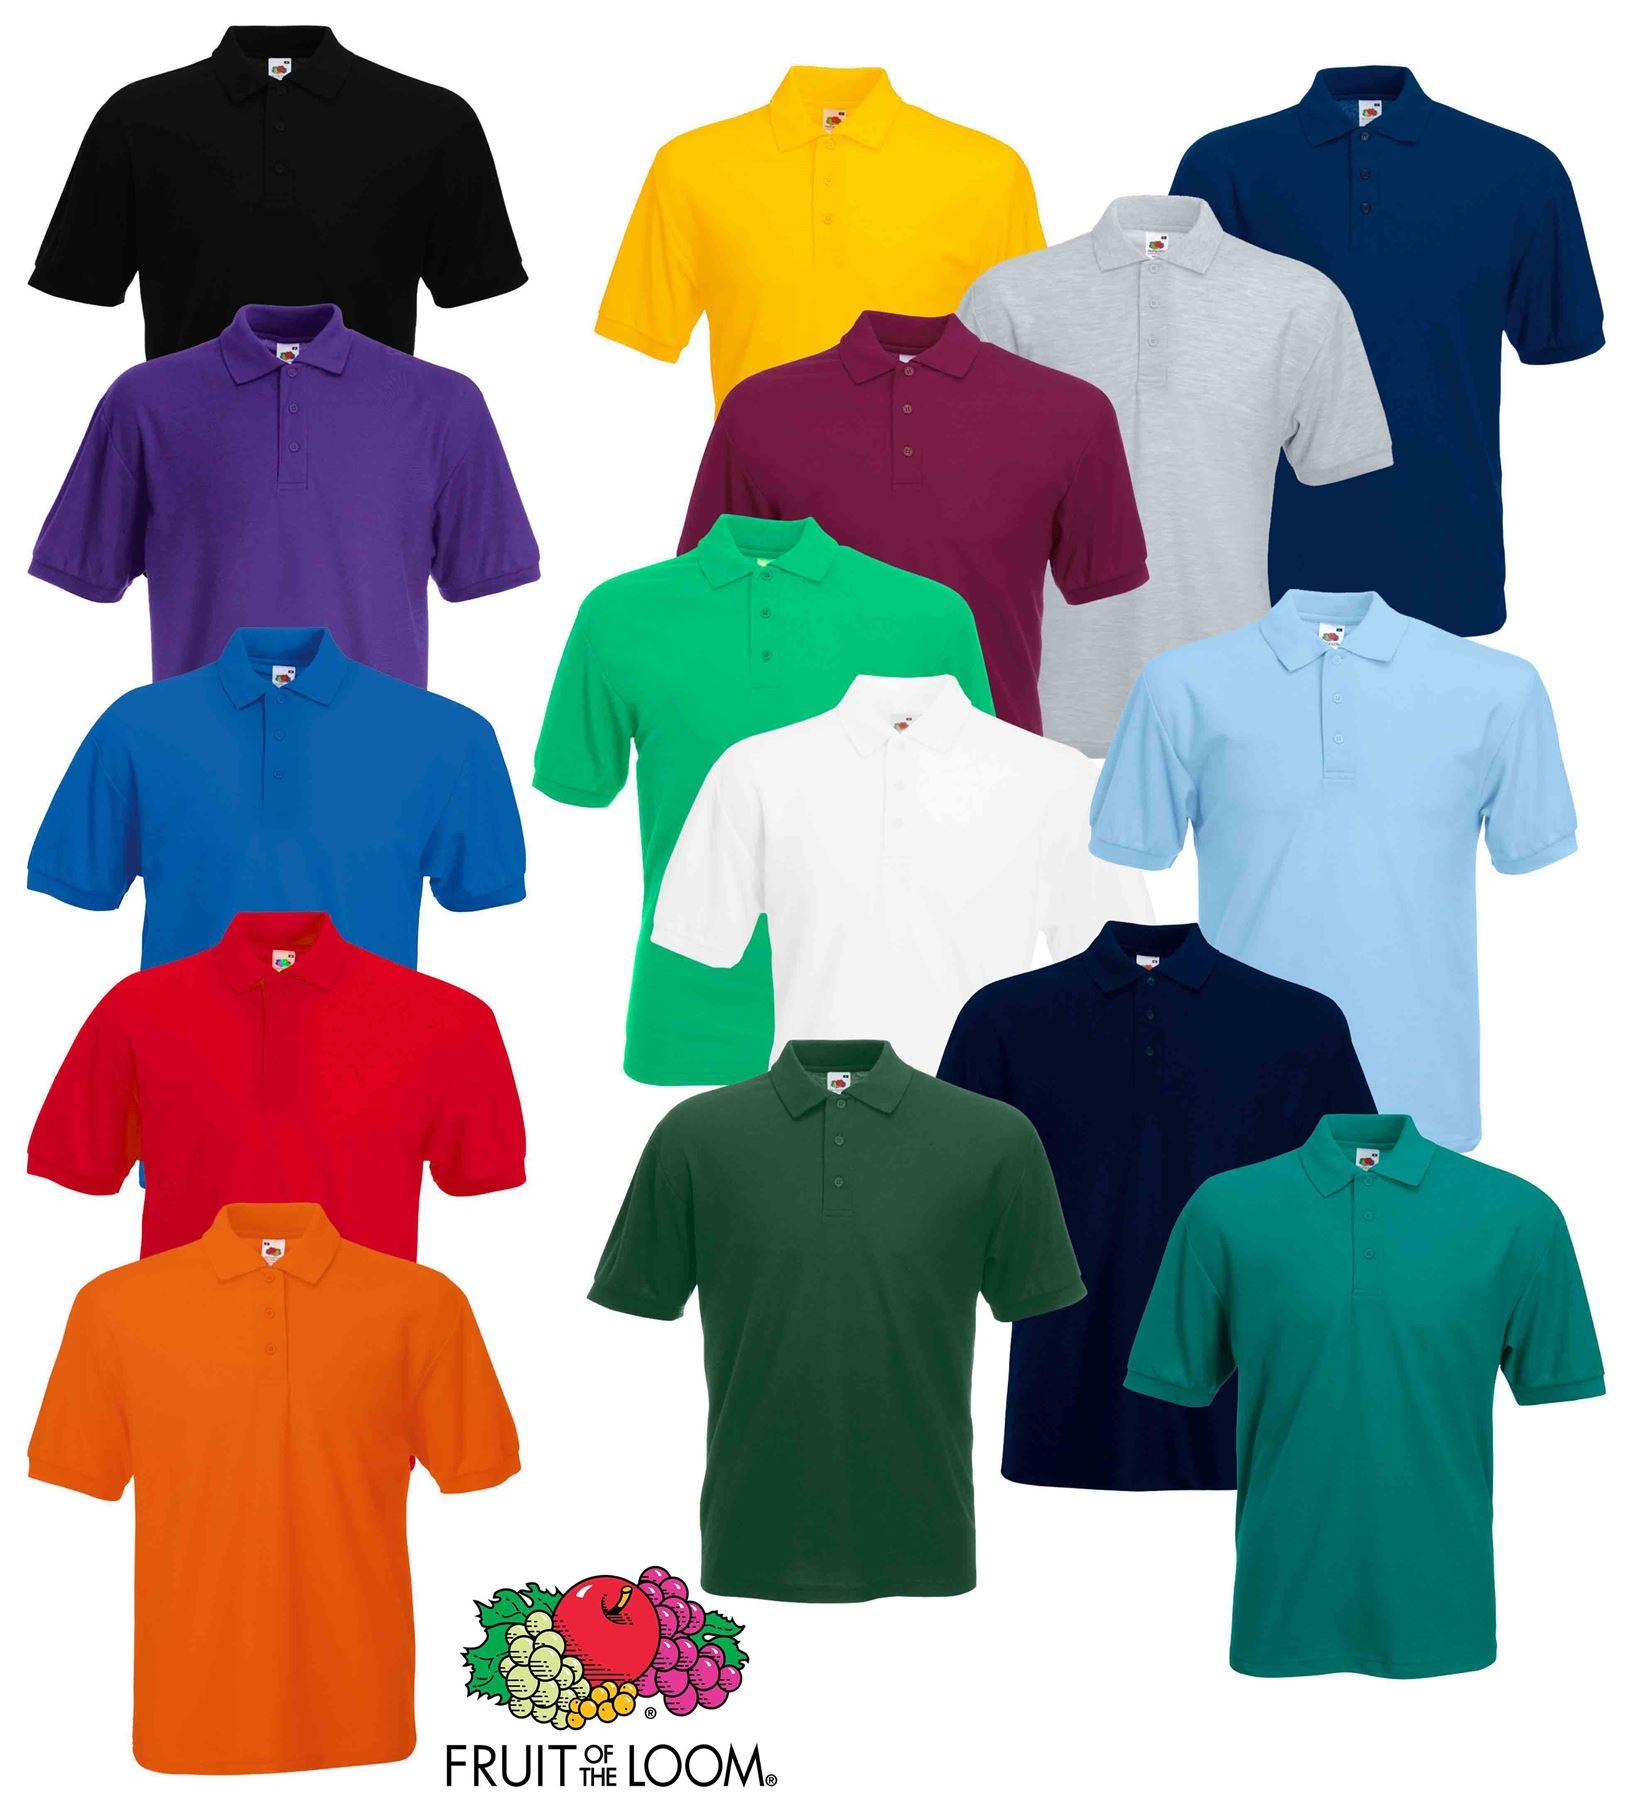 19a18f6a Fruit of the Loom Plain Cotton Mens Polo Shirts T-Shirt Short Sleeve ...